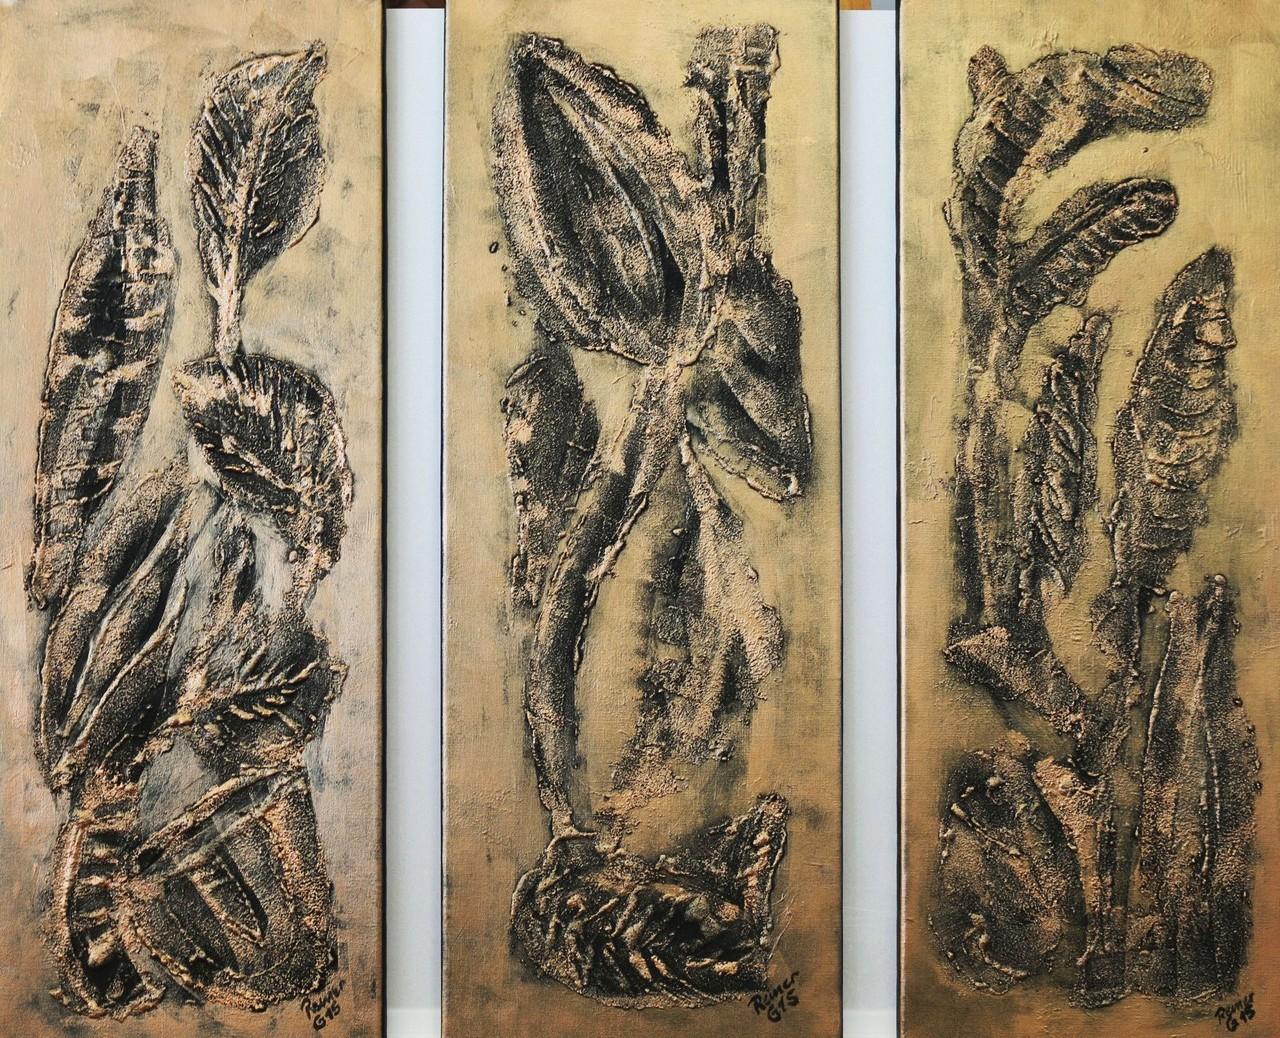 Florale Impression 1-3,Acryl,Sand auf Leinwand, 80 x 30 cm